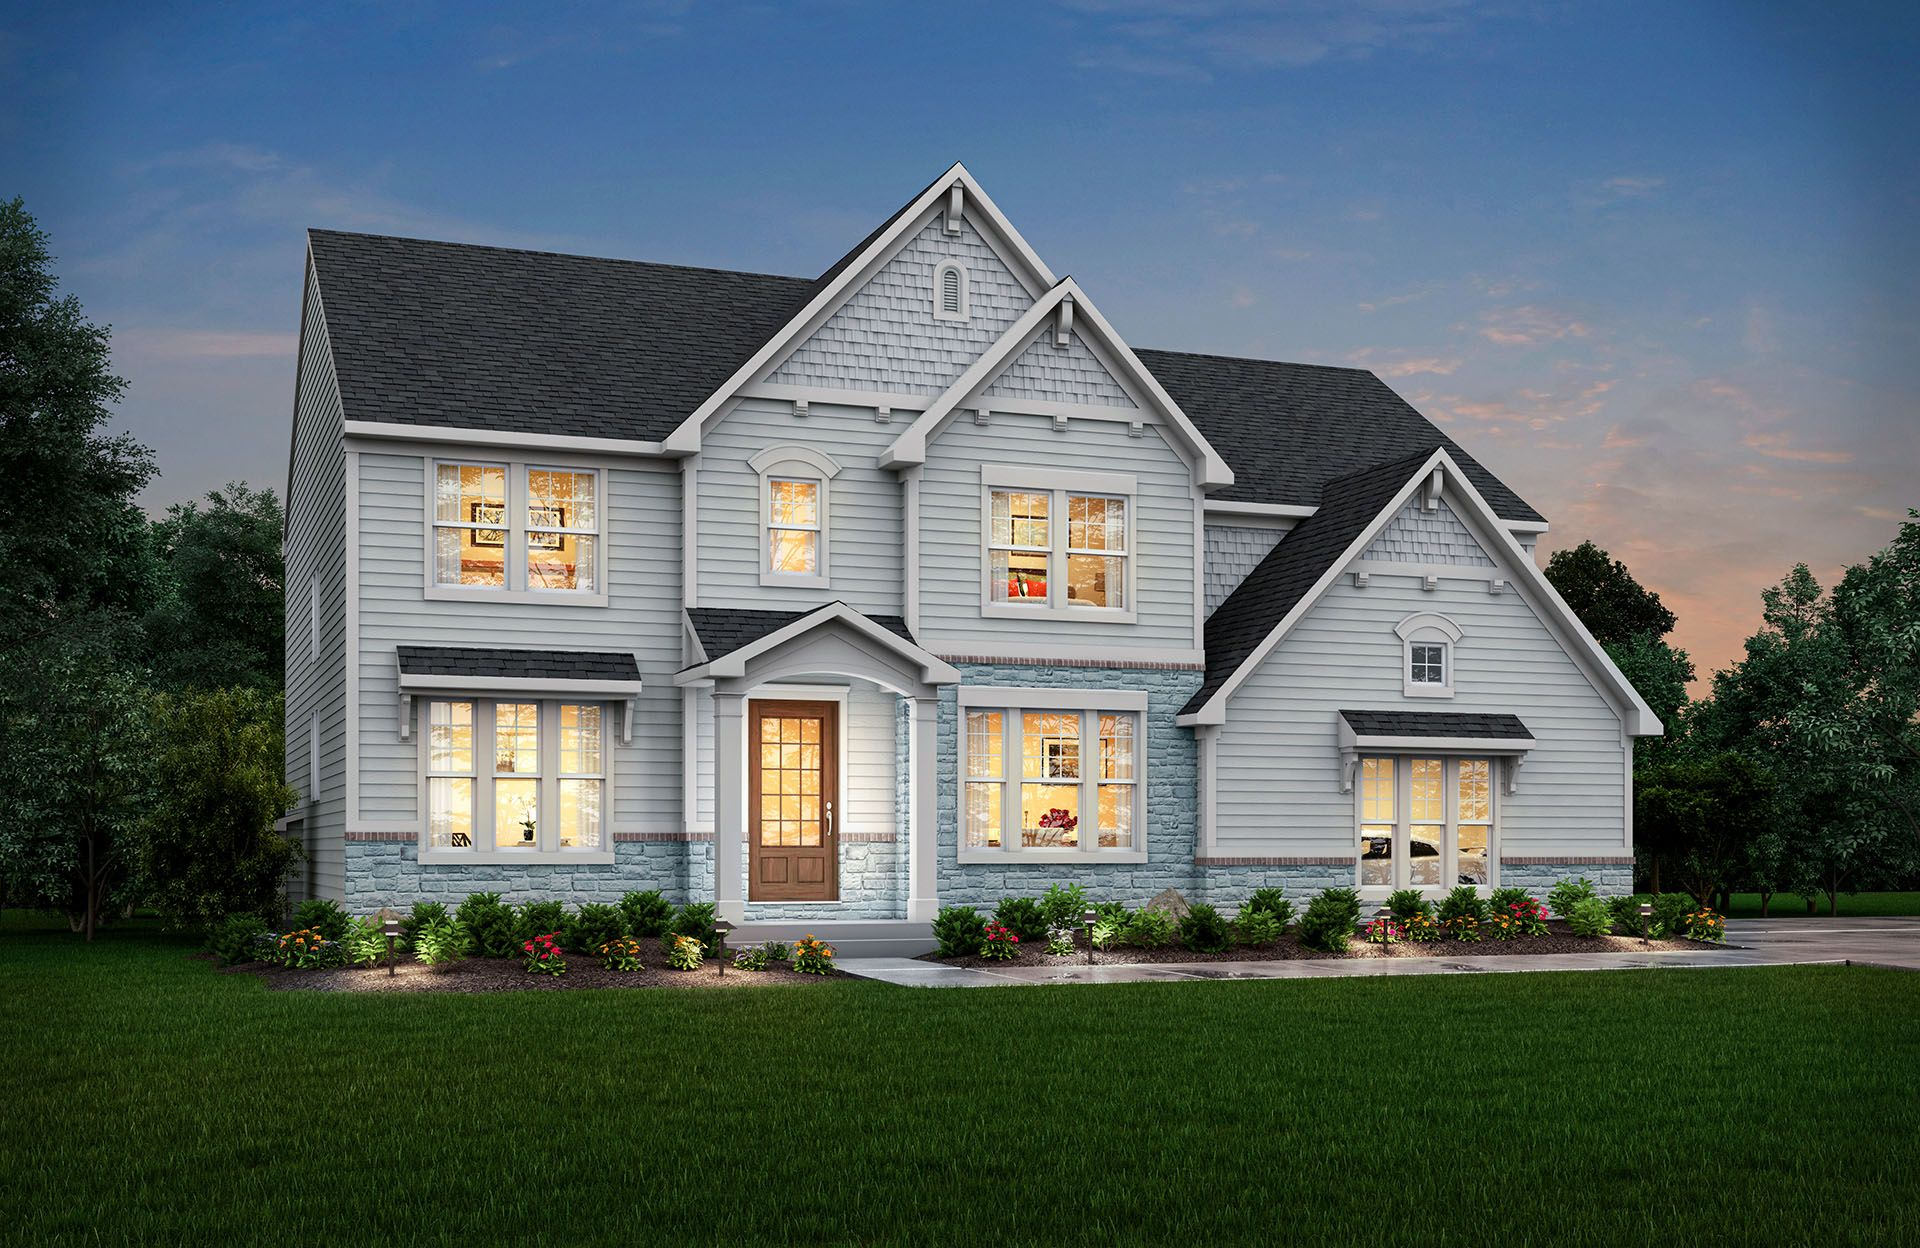 Ash Lawn   Woodcreek Crossing Community: Avon, Indiana   Drees Homes